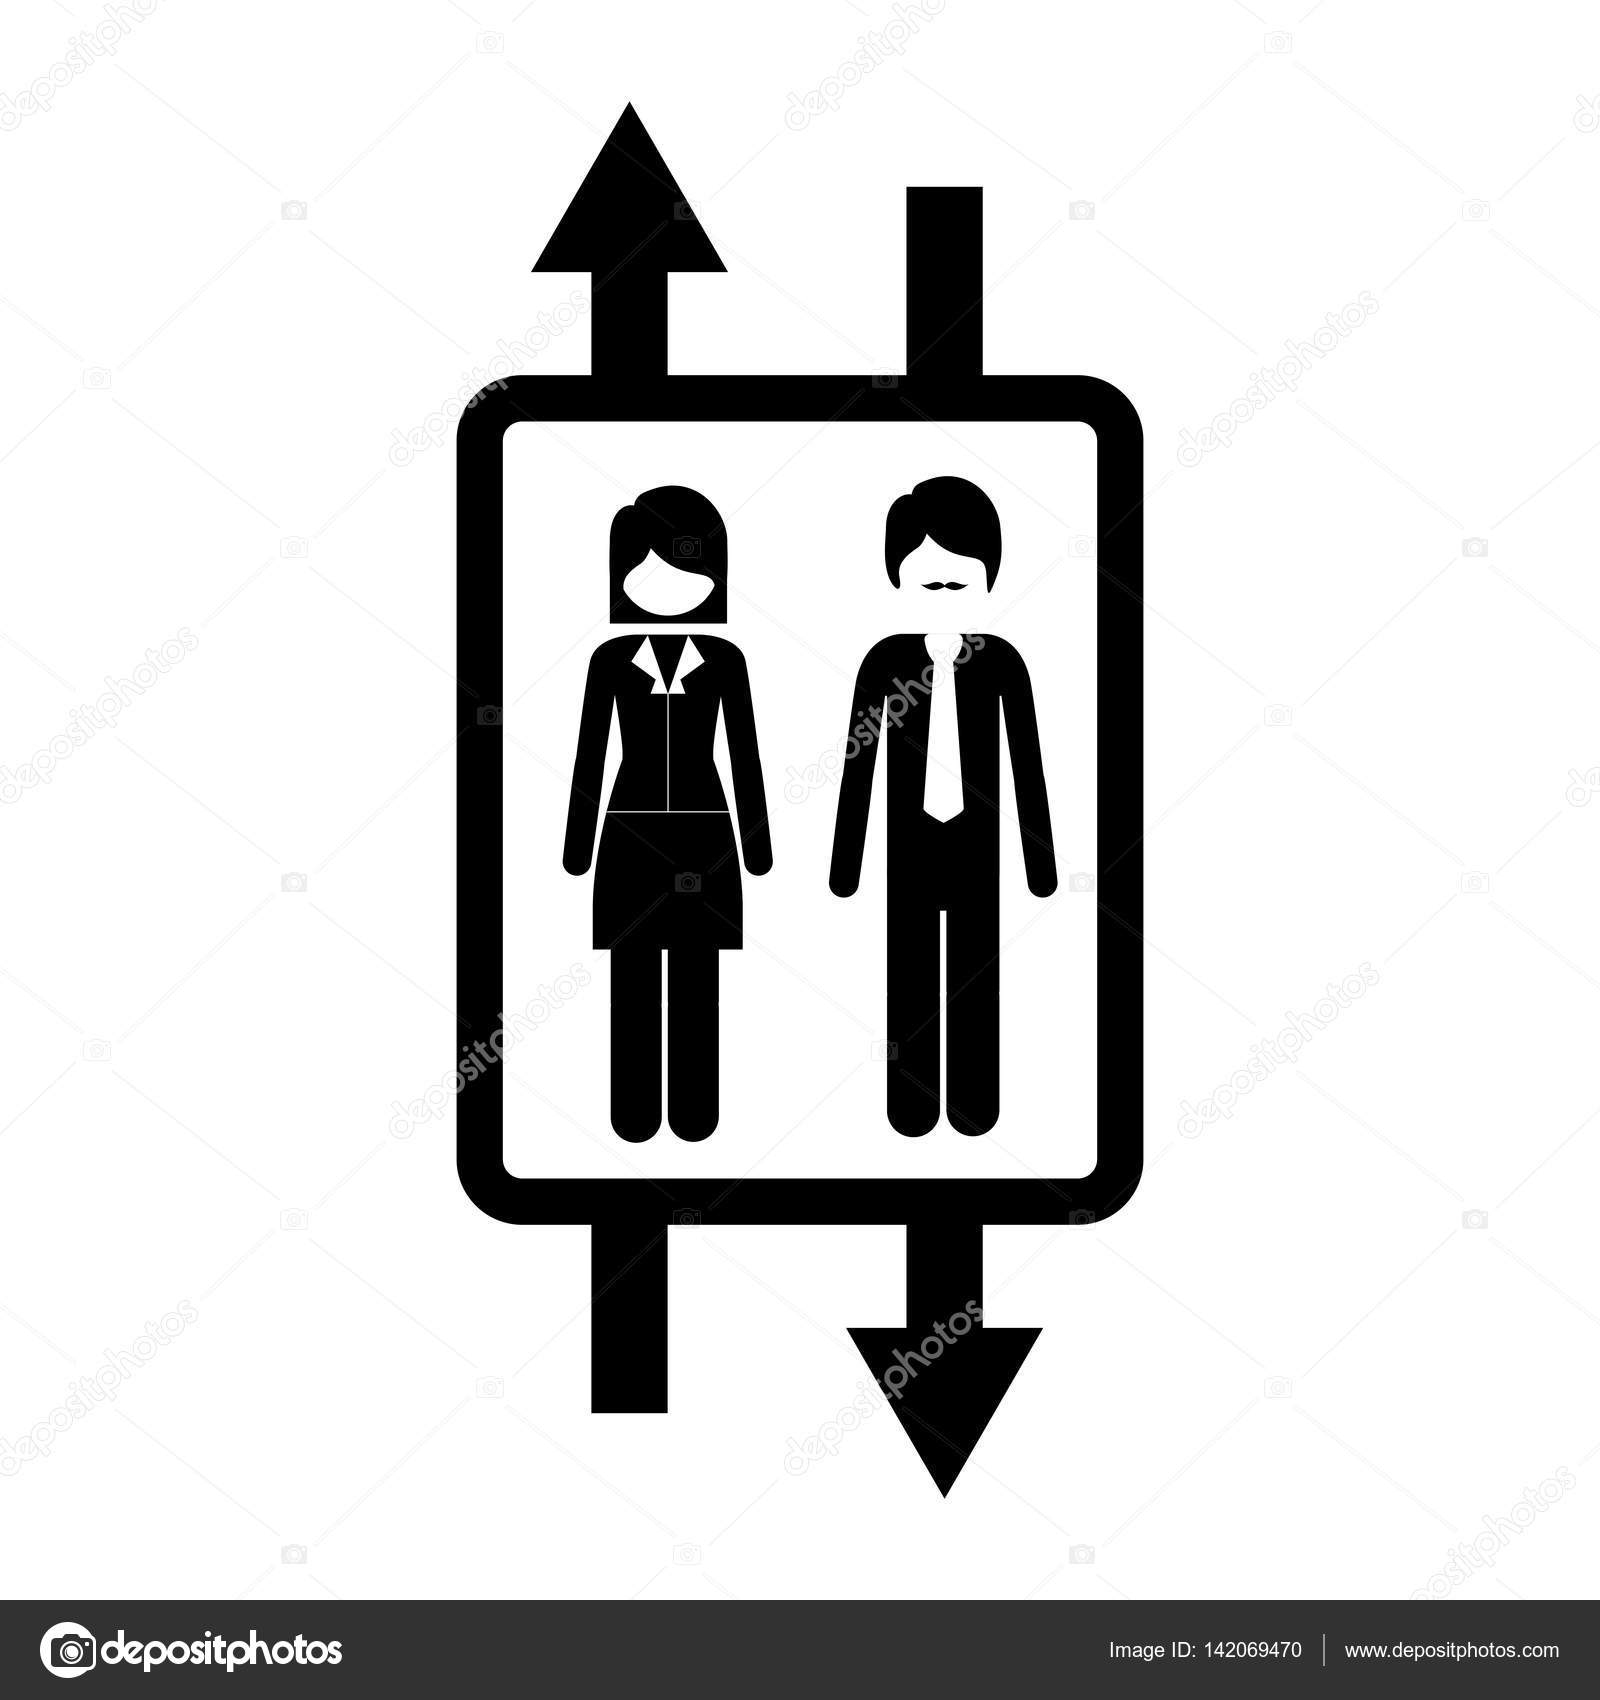 people inside elevator. elevator with people inside icon \u2014 stock vector #142069470